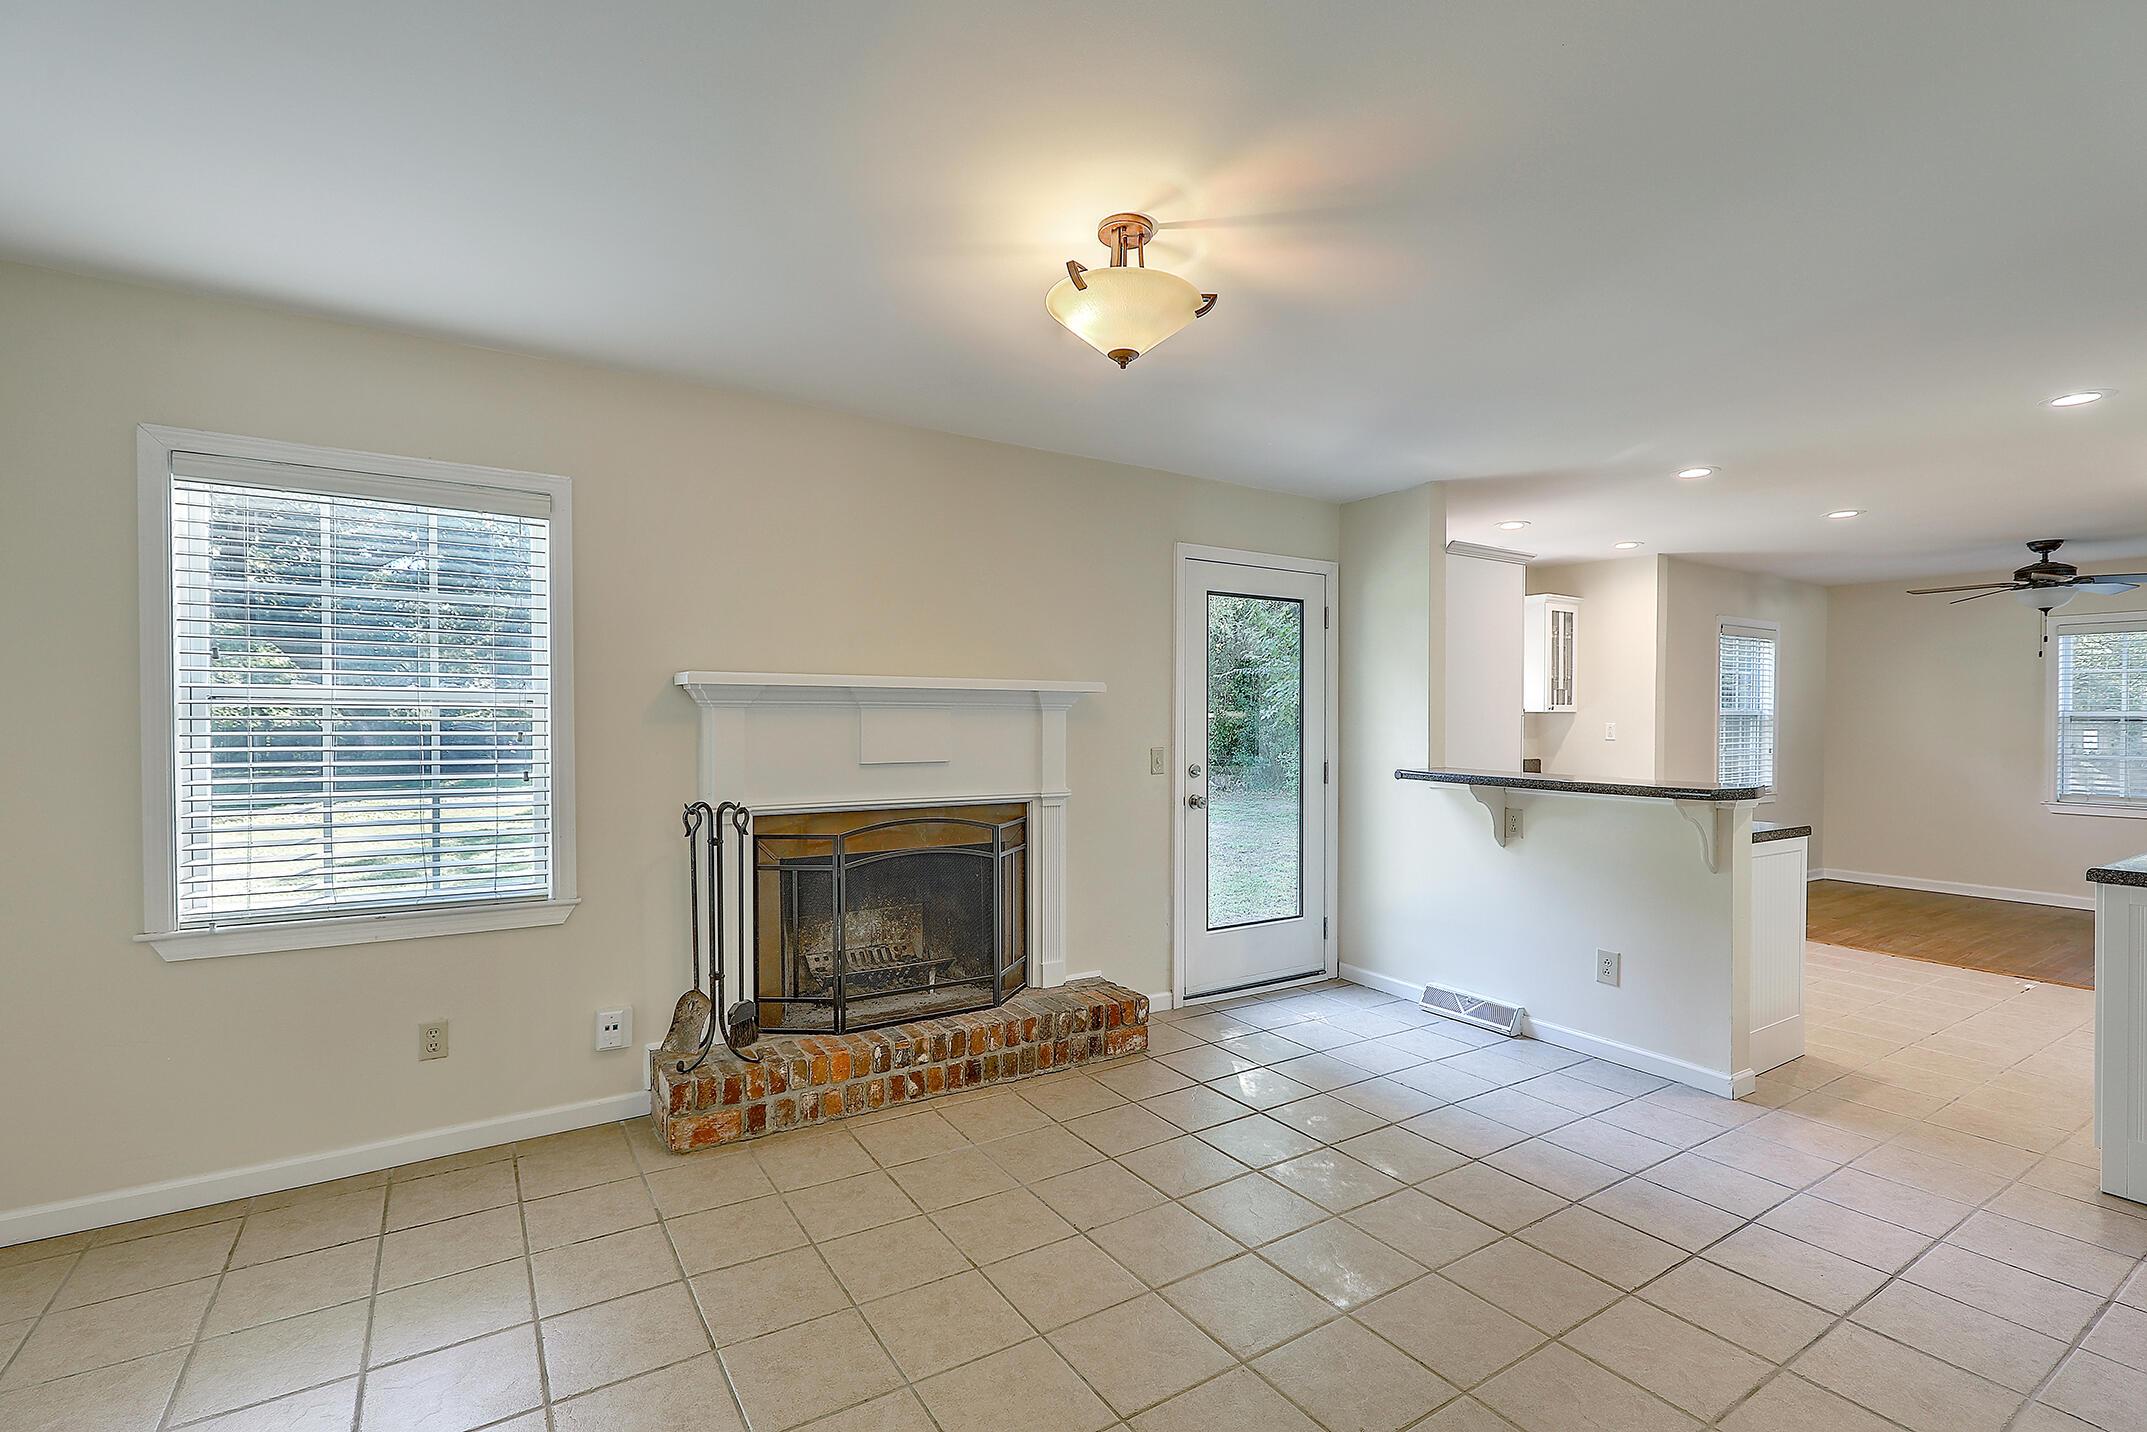 Cooper Estates Homes For Sale - 901 Searle, Mount Pleasant, SC - 15